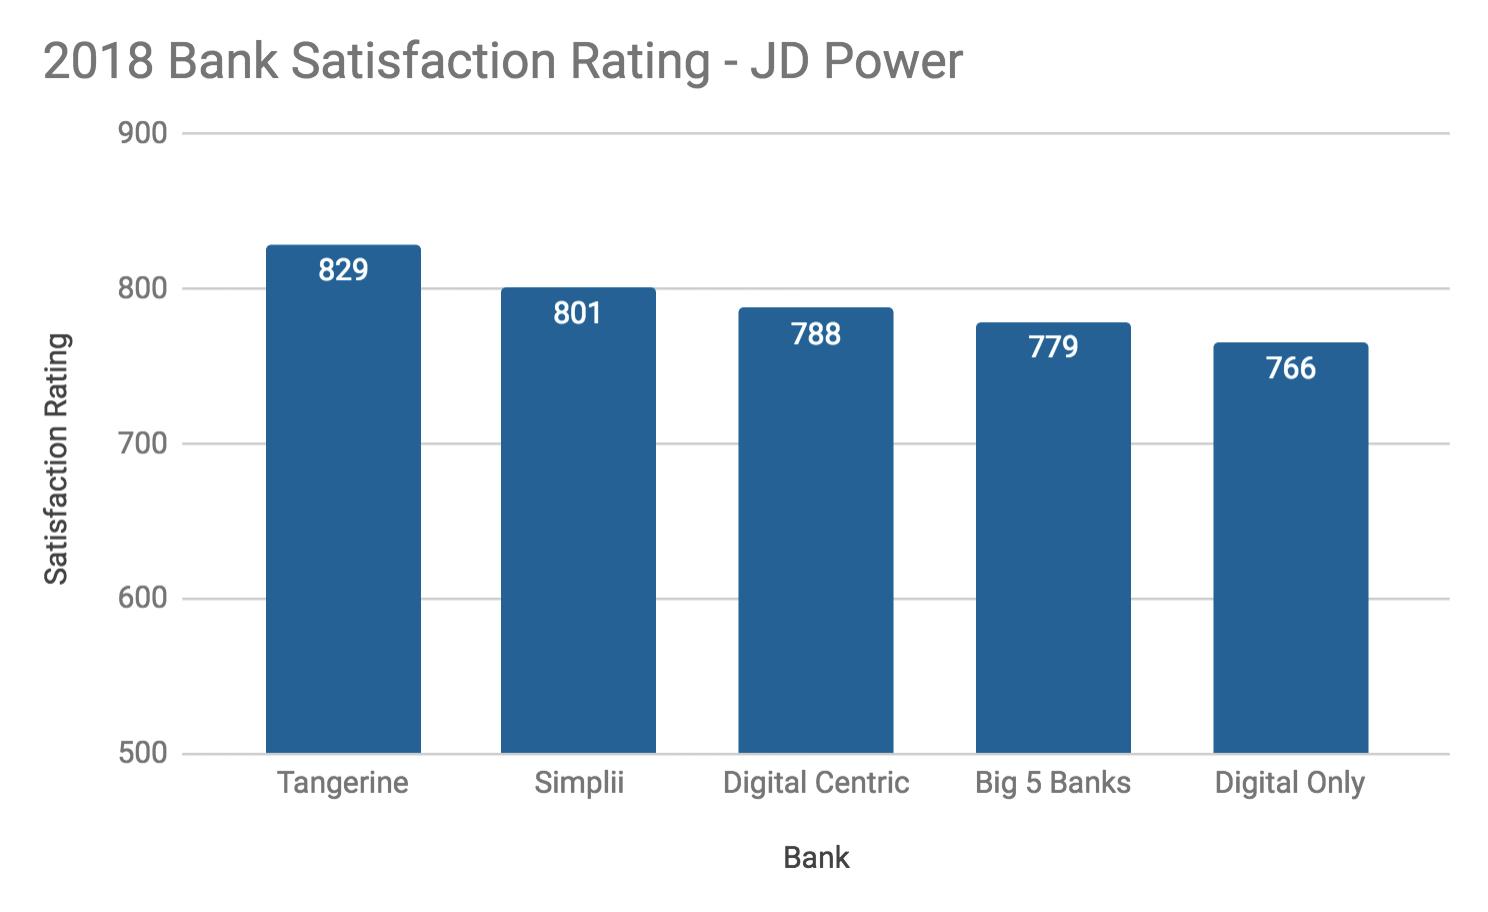 Source: JD Power Retail Banking Satisfaction Study, 2018